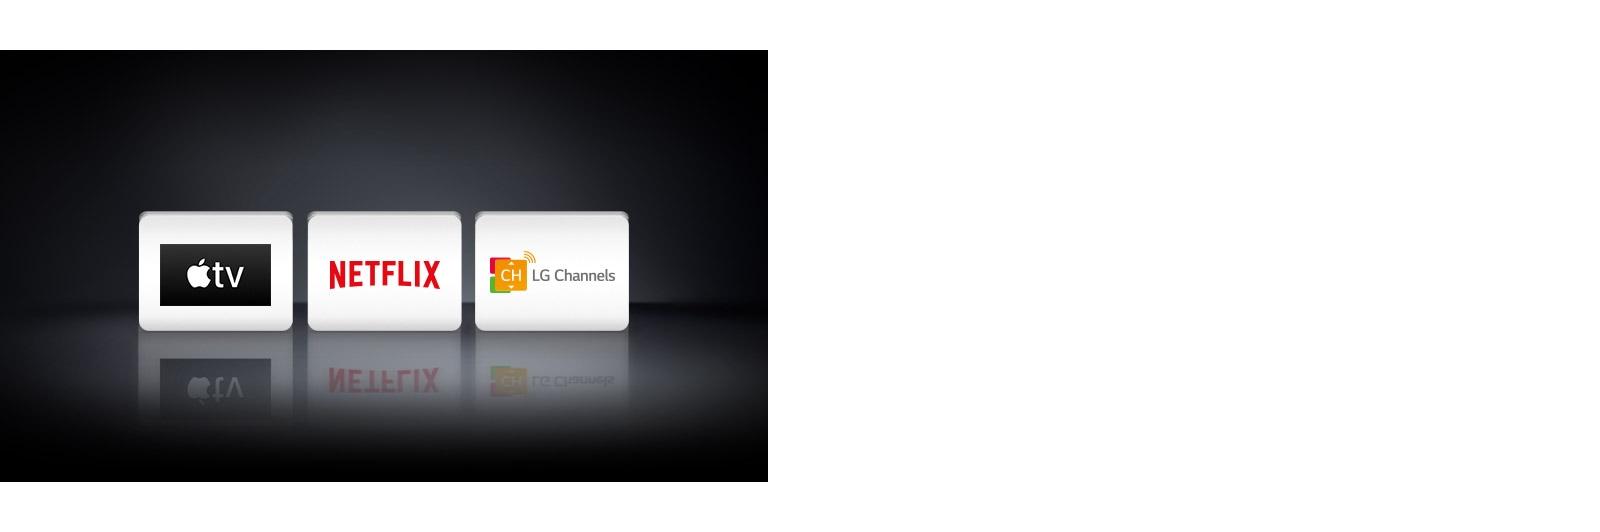 Tři loga: Apple TV, Netflix aLG Channels